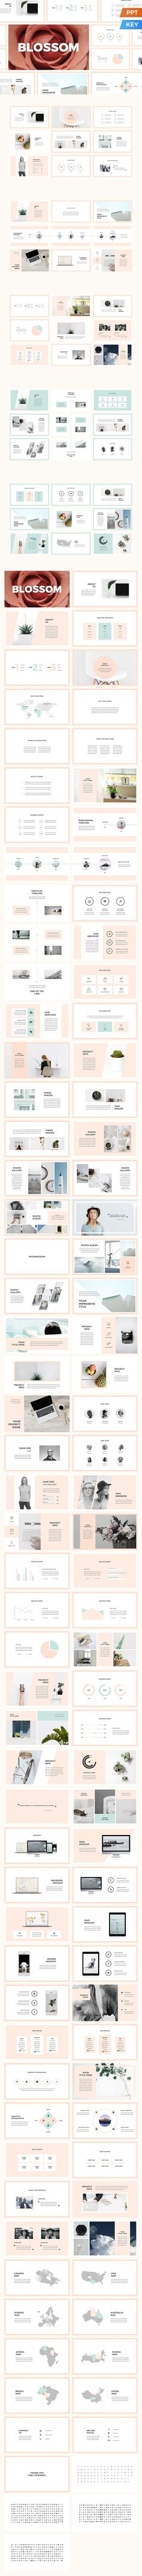 Blossom Presentation Template. Business Infographic